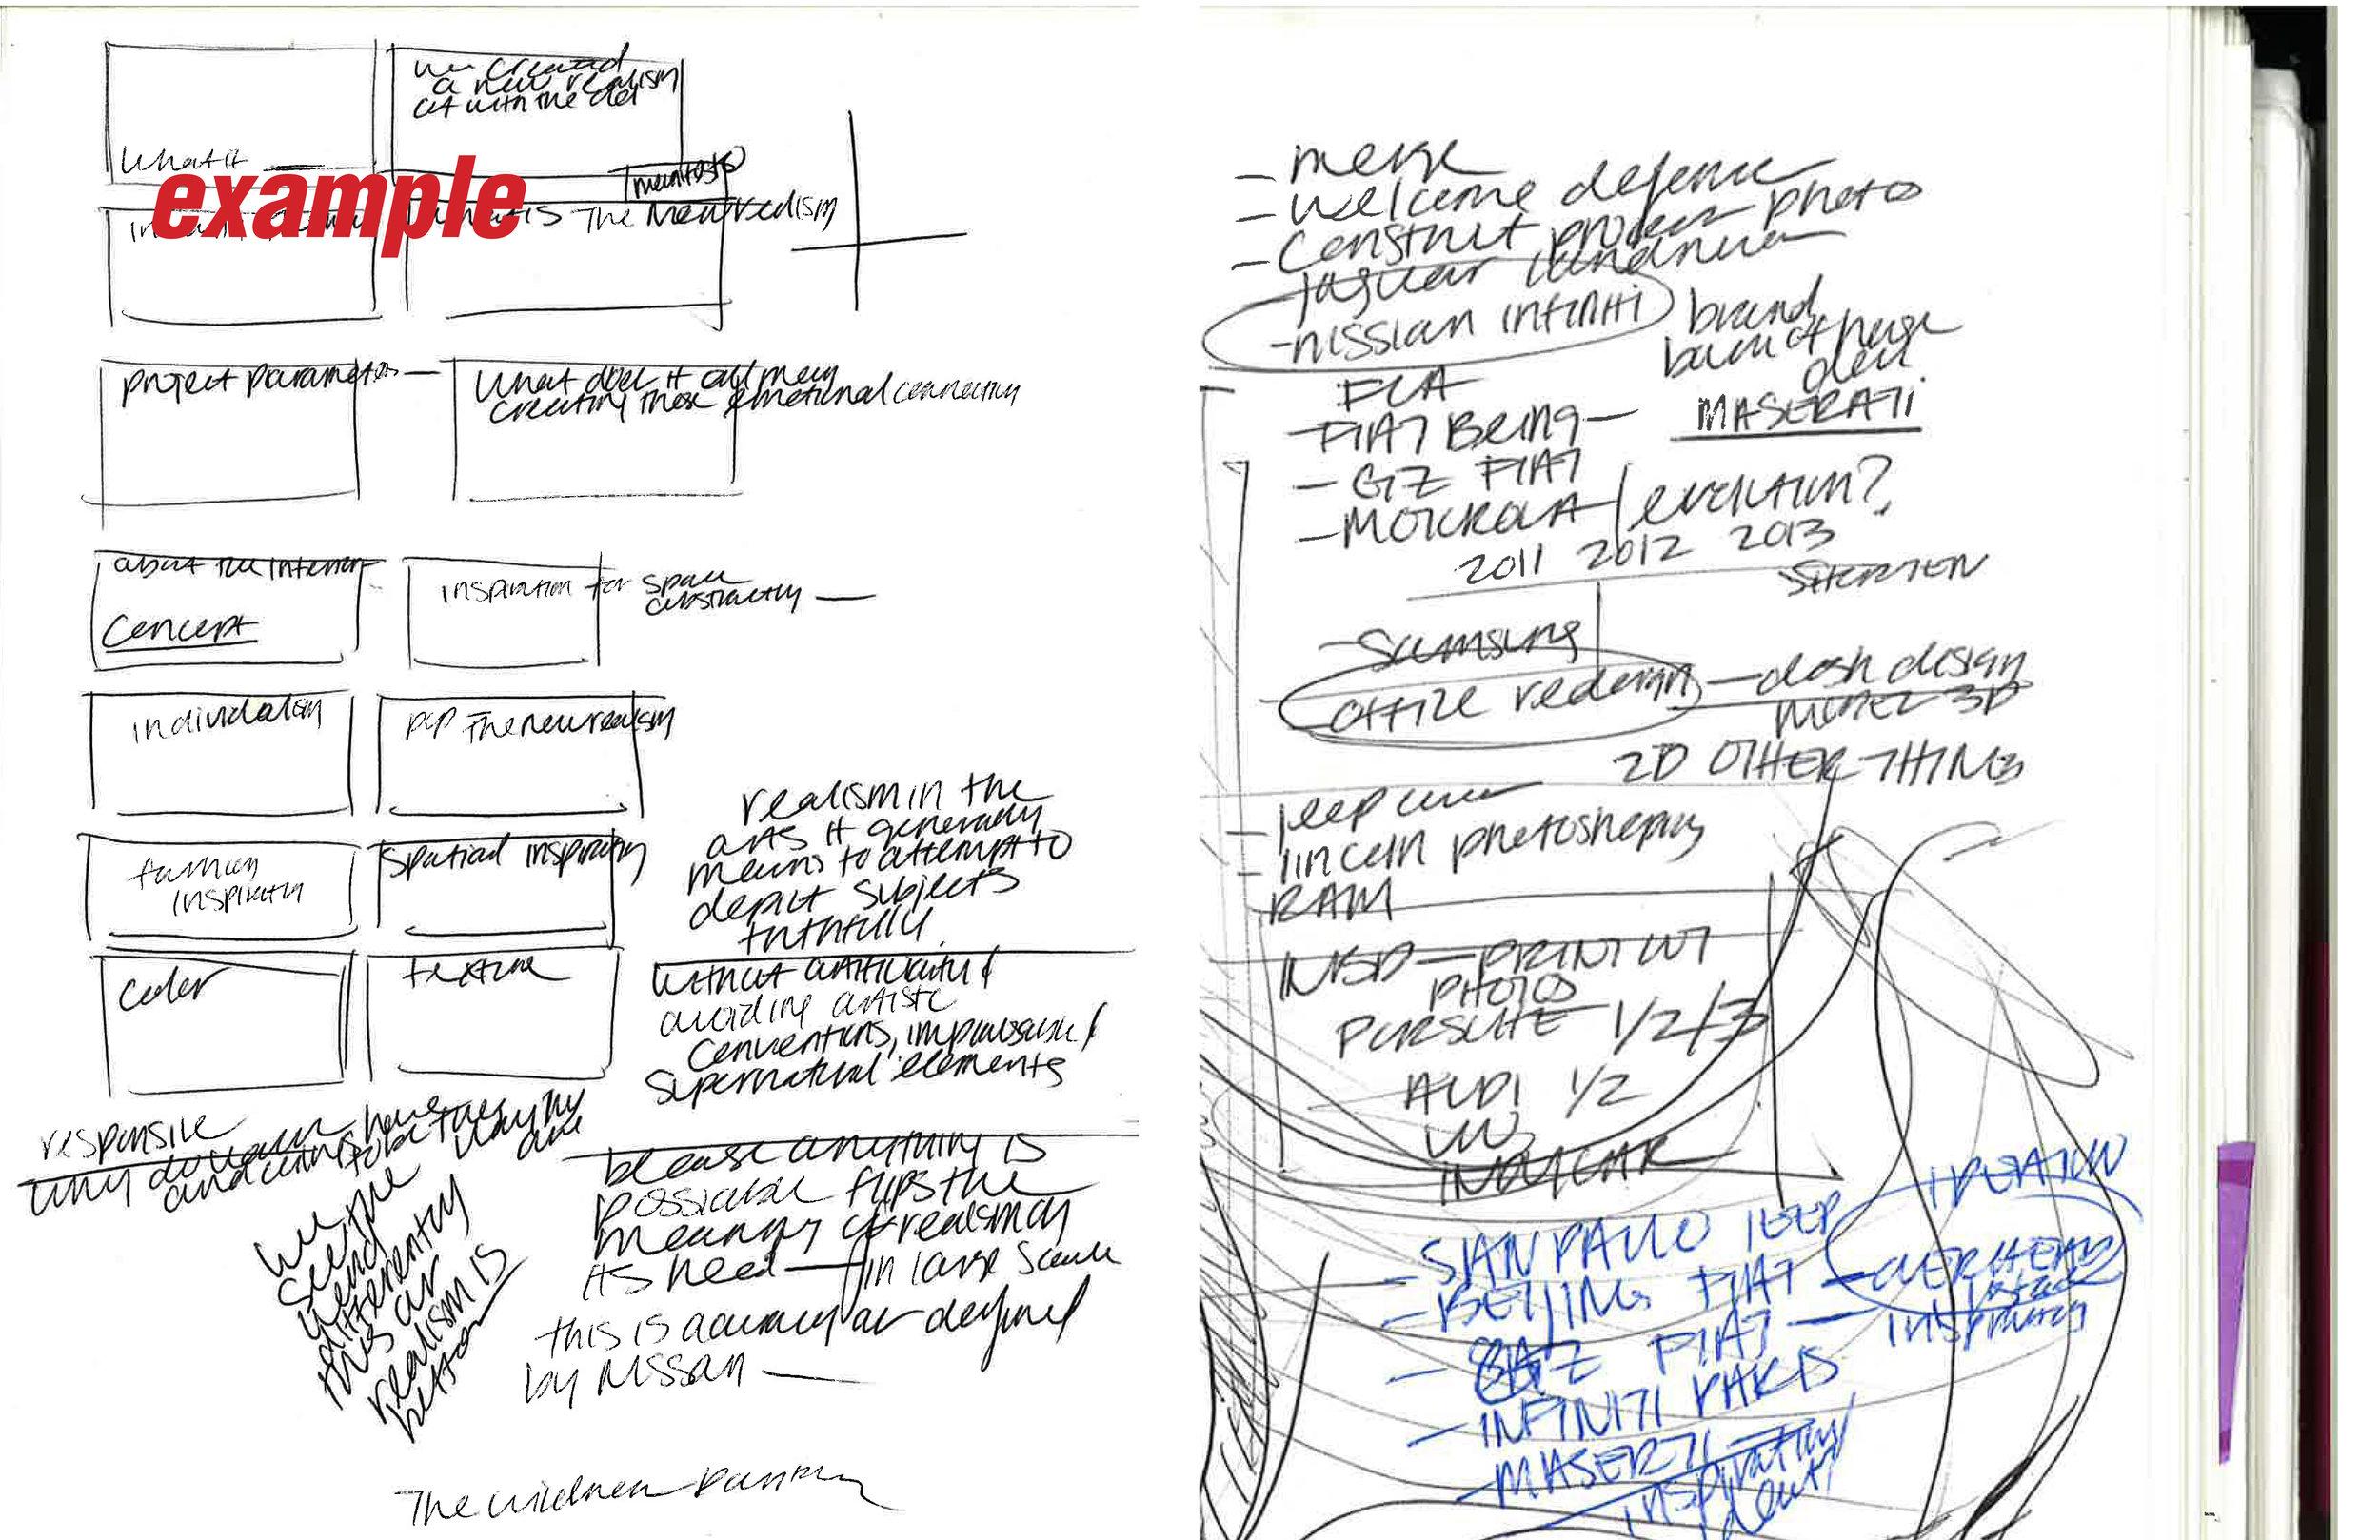 Interior_Design_StoryTelling_09_16_14-7.jpg